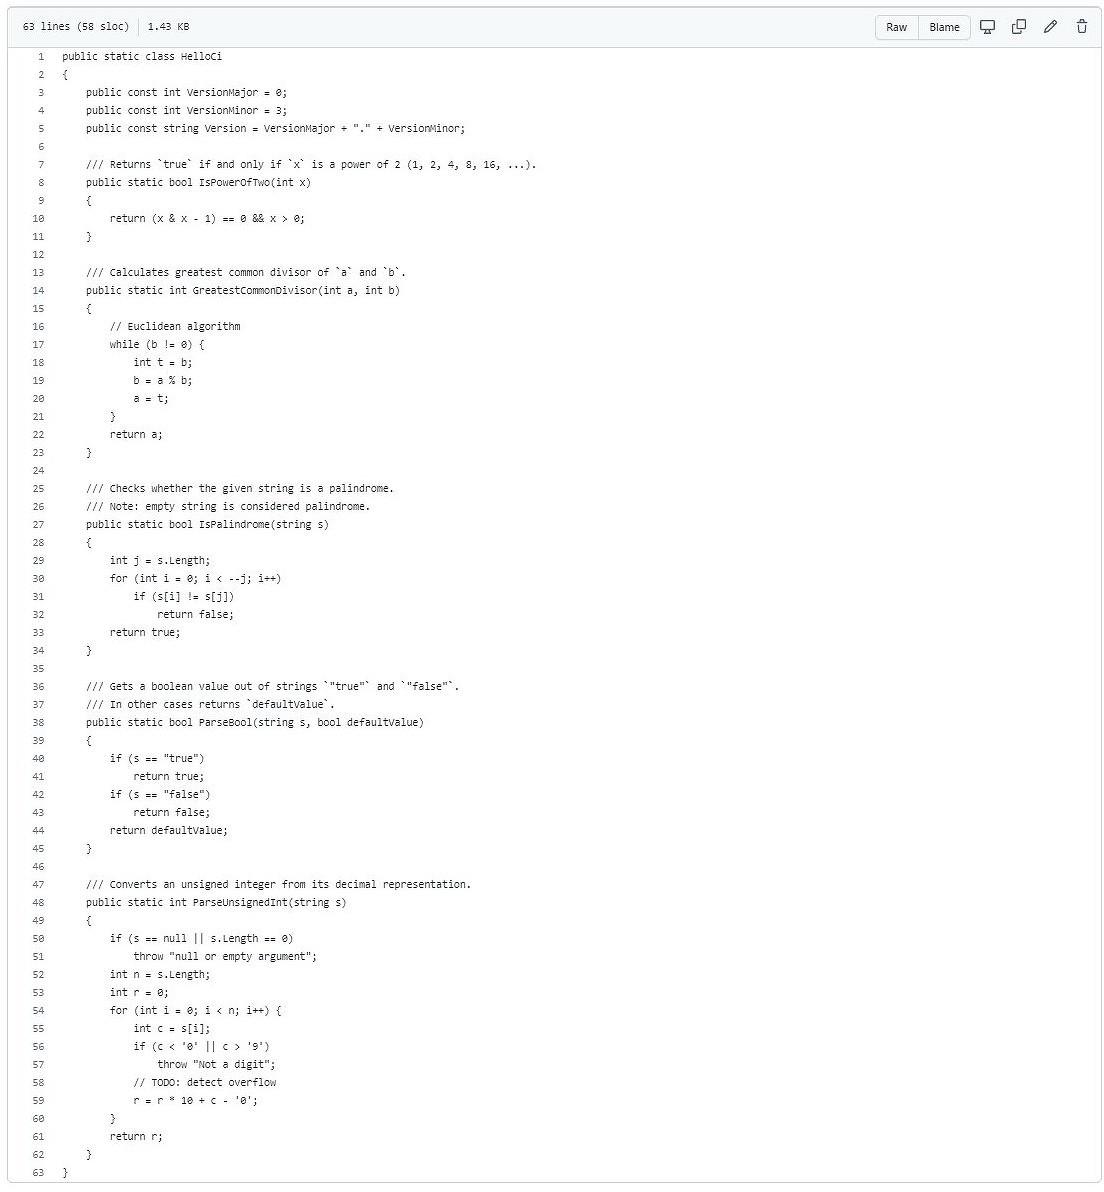 cod601.jpg